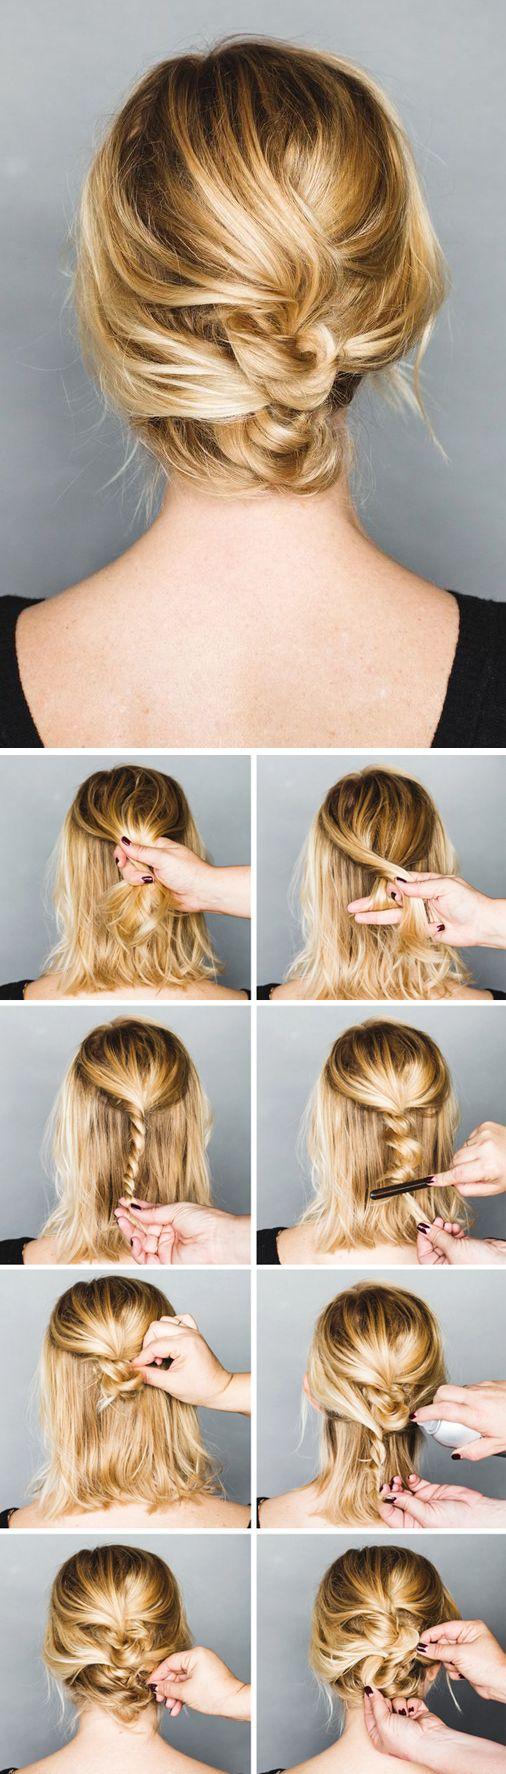 Pinterest Boo2cute Hair Styles Pinterest Updo Messy